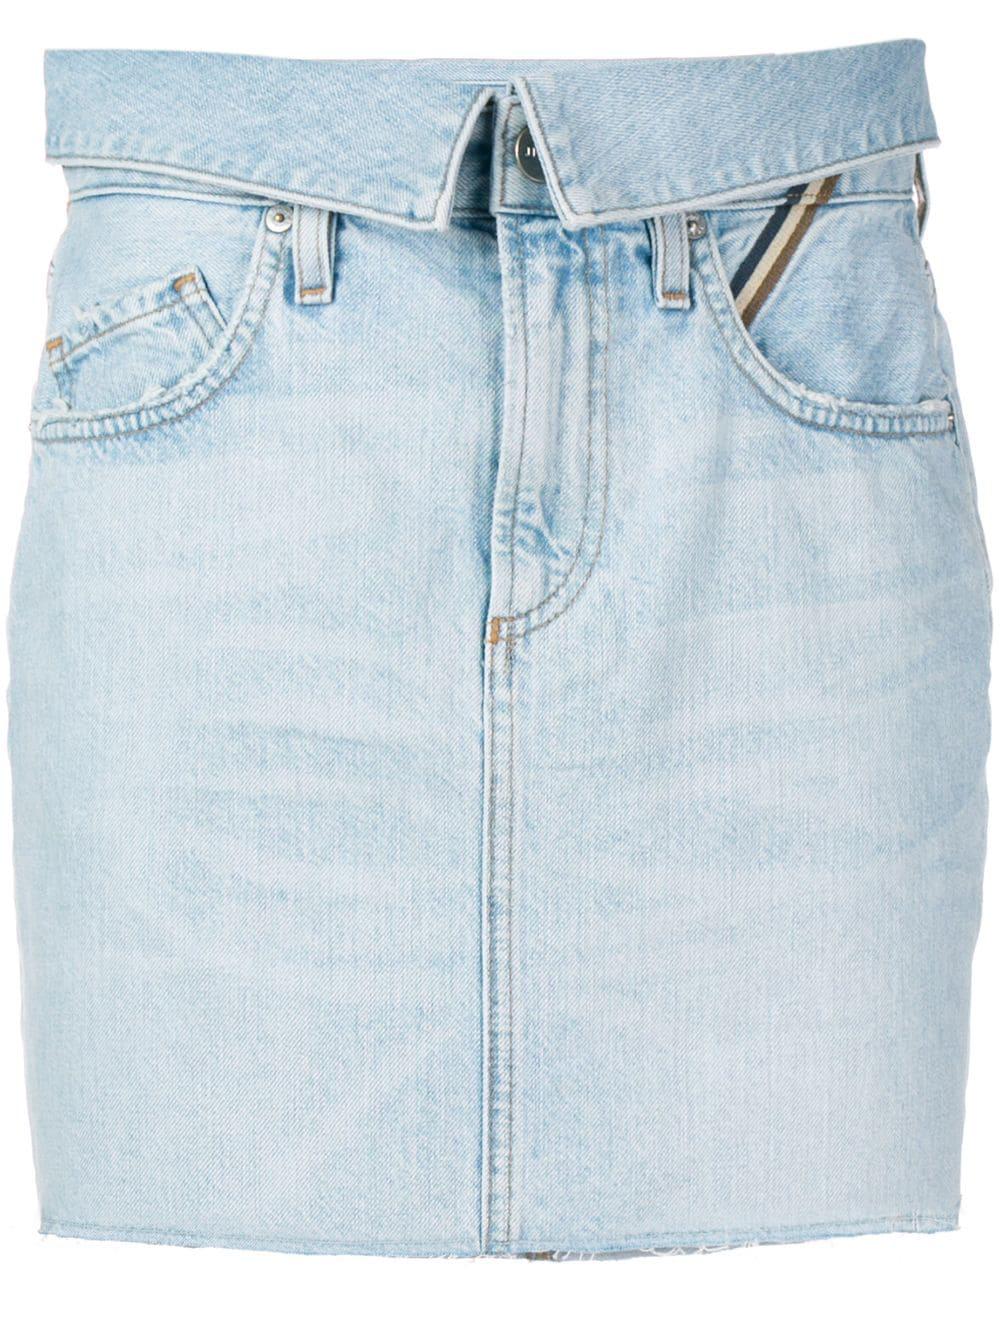 2a42bf0389c Jean Atelier Denim Mini Skirt - Blue